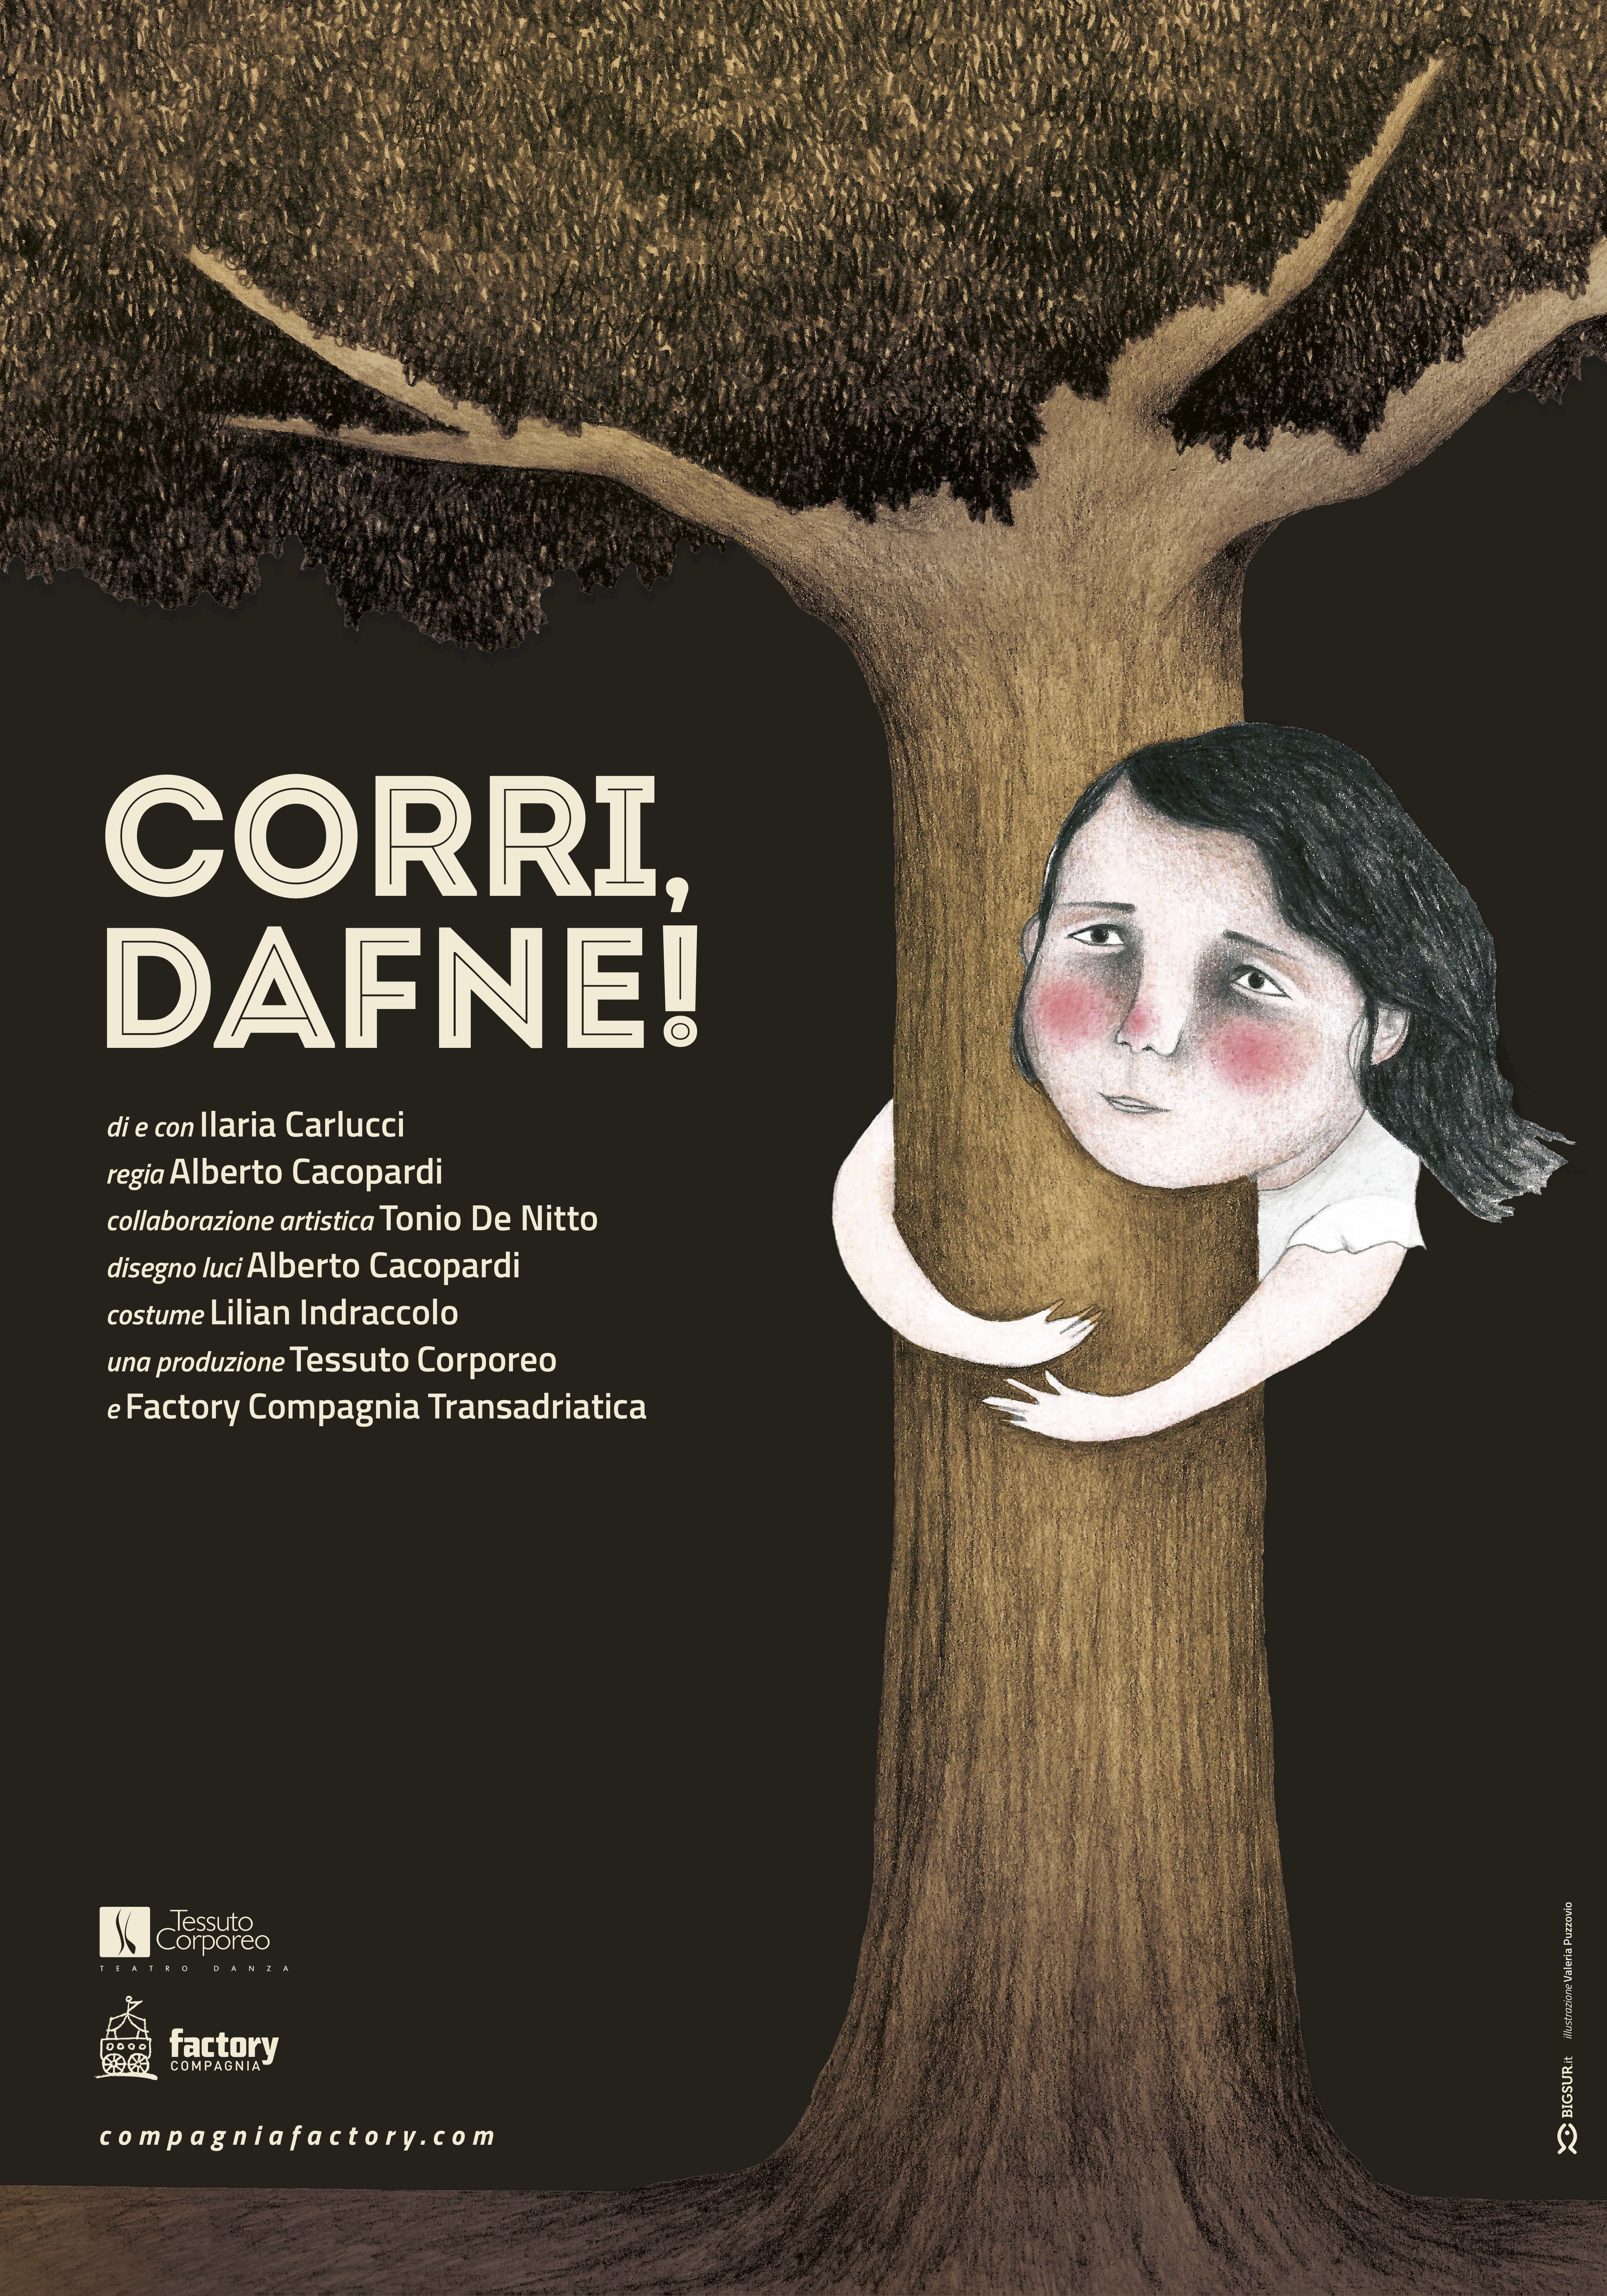 Corri Dafne_70x100_2